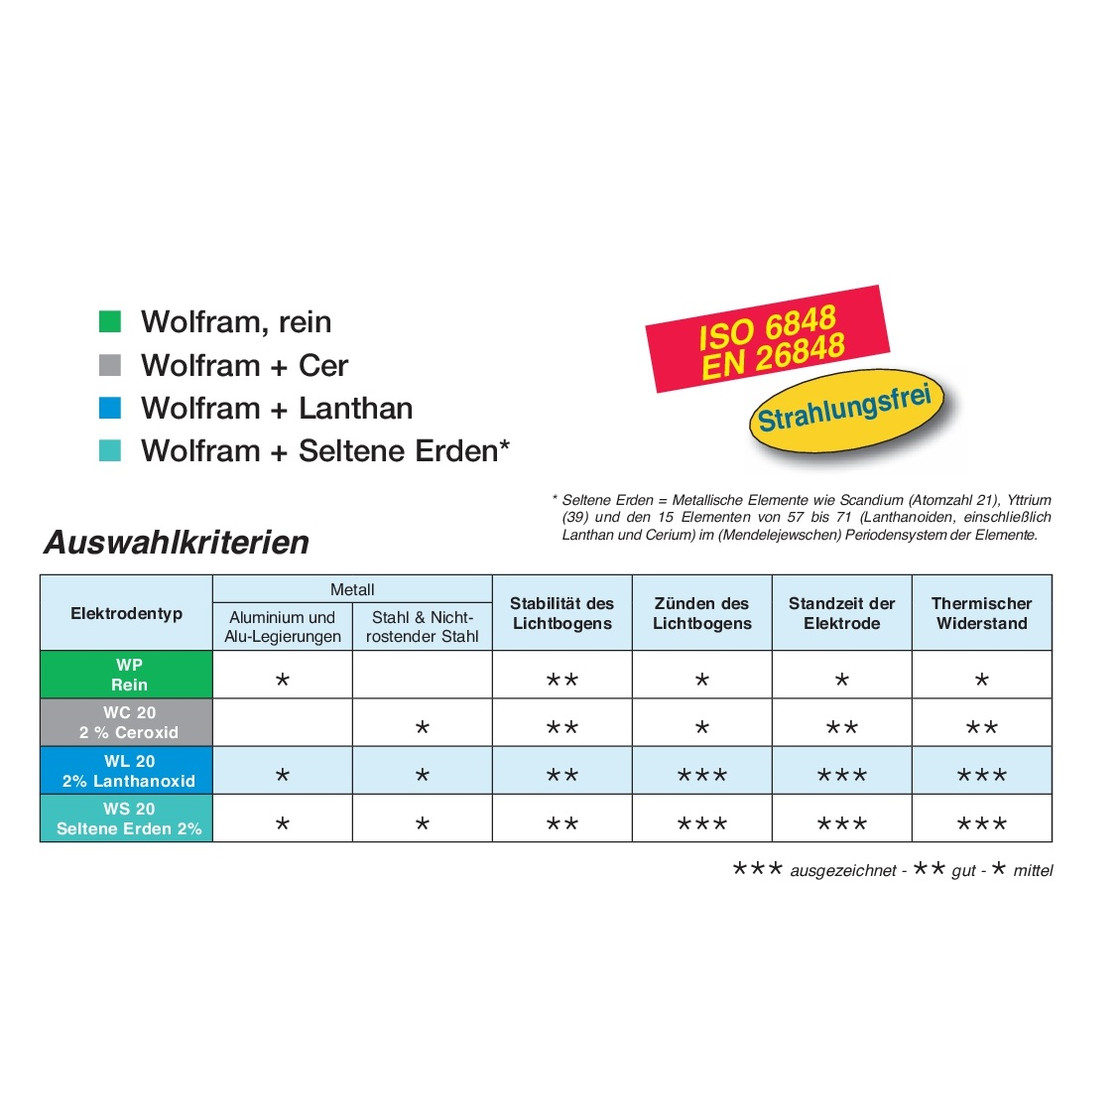 Wolfram Elektroden 1.0-4.0mm X 175mm Tig Lila Spitze Zirconiated Haltbar